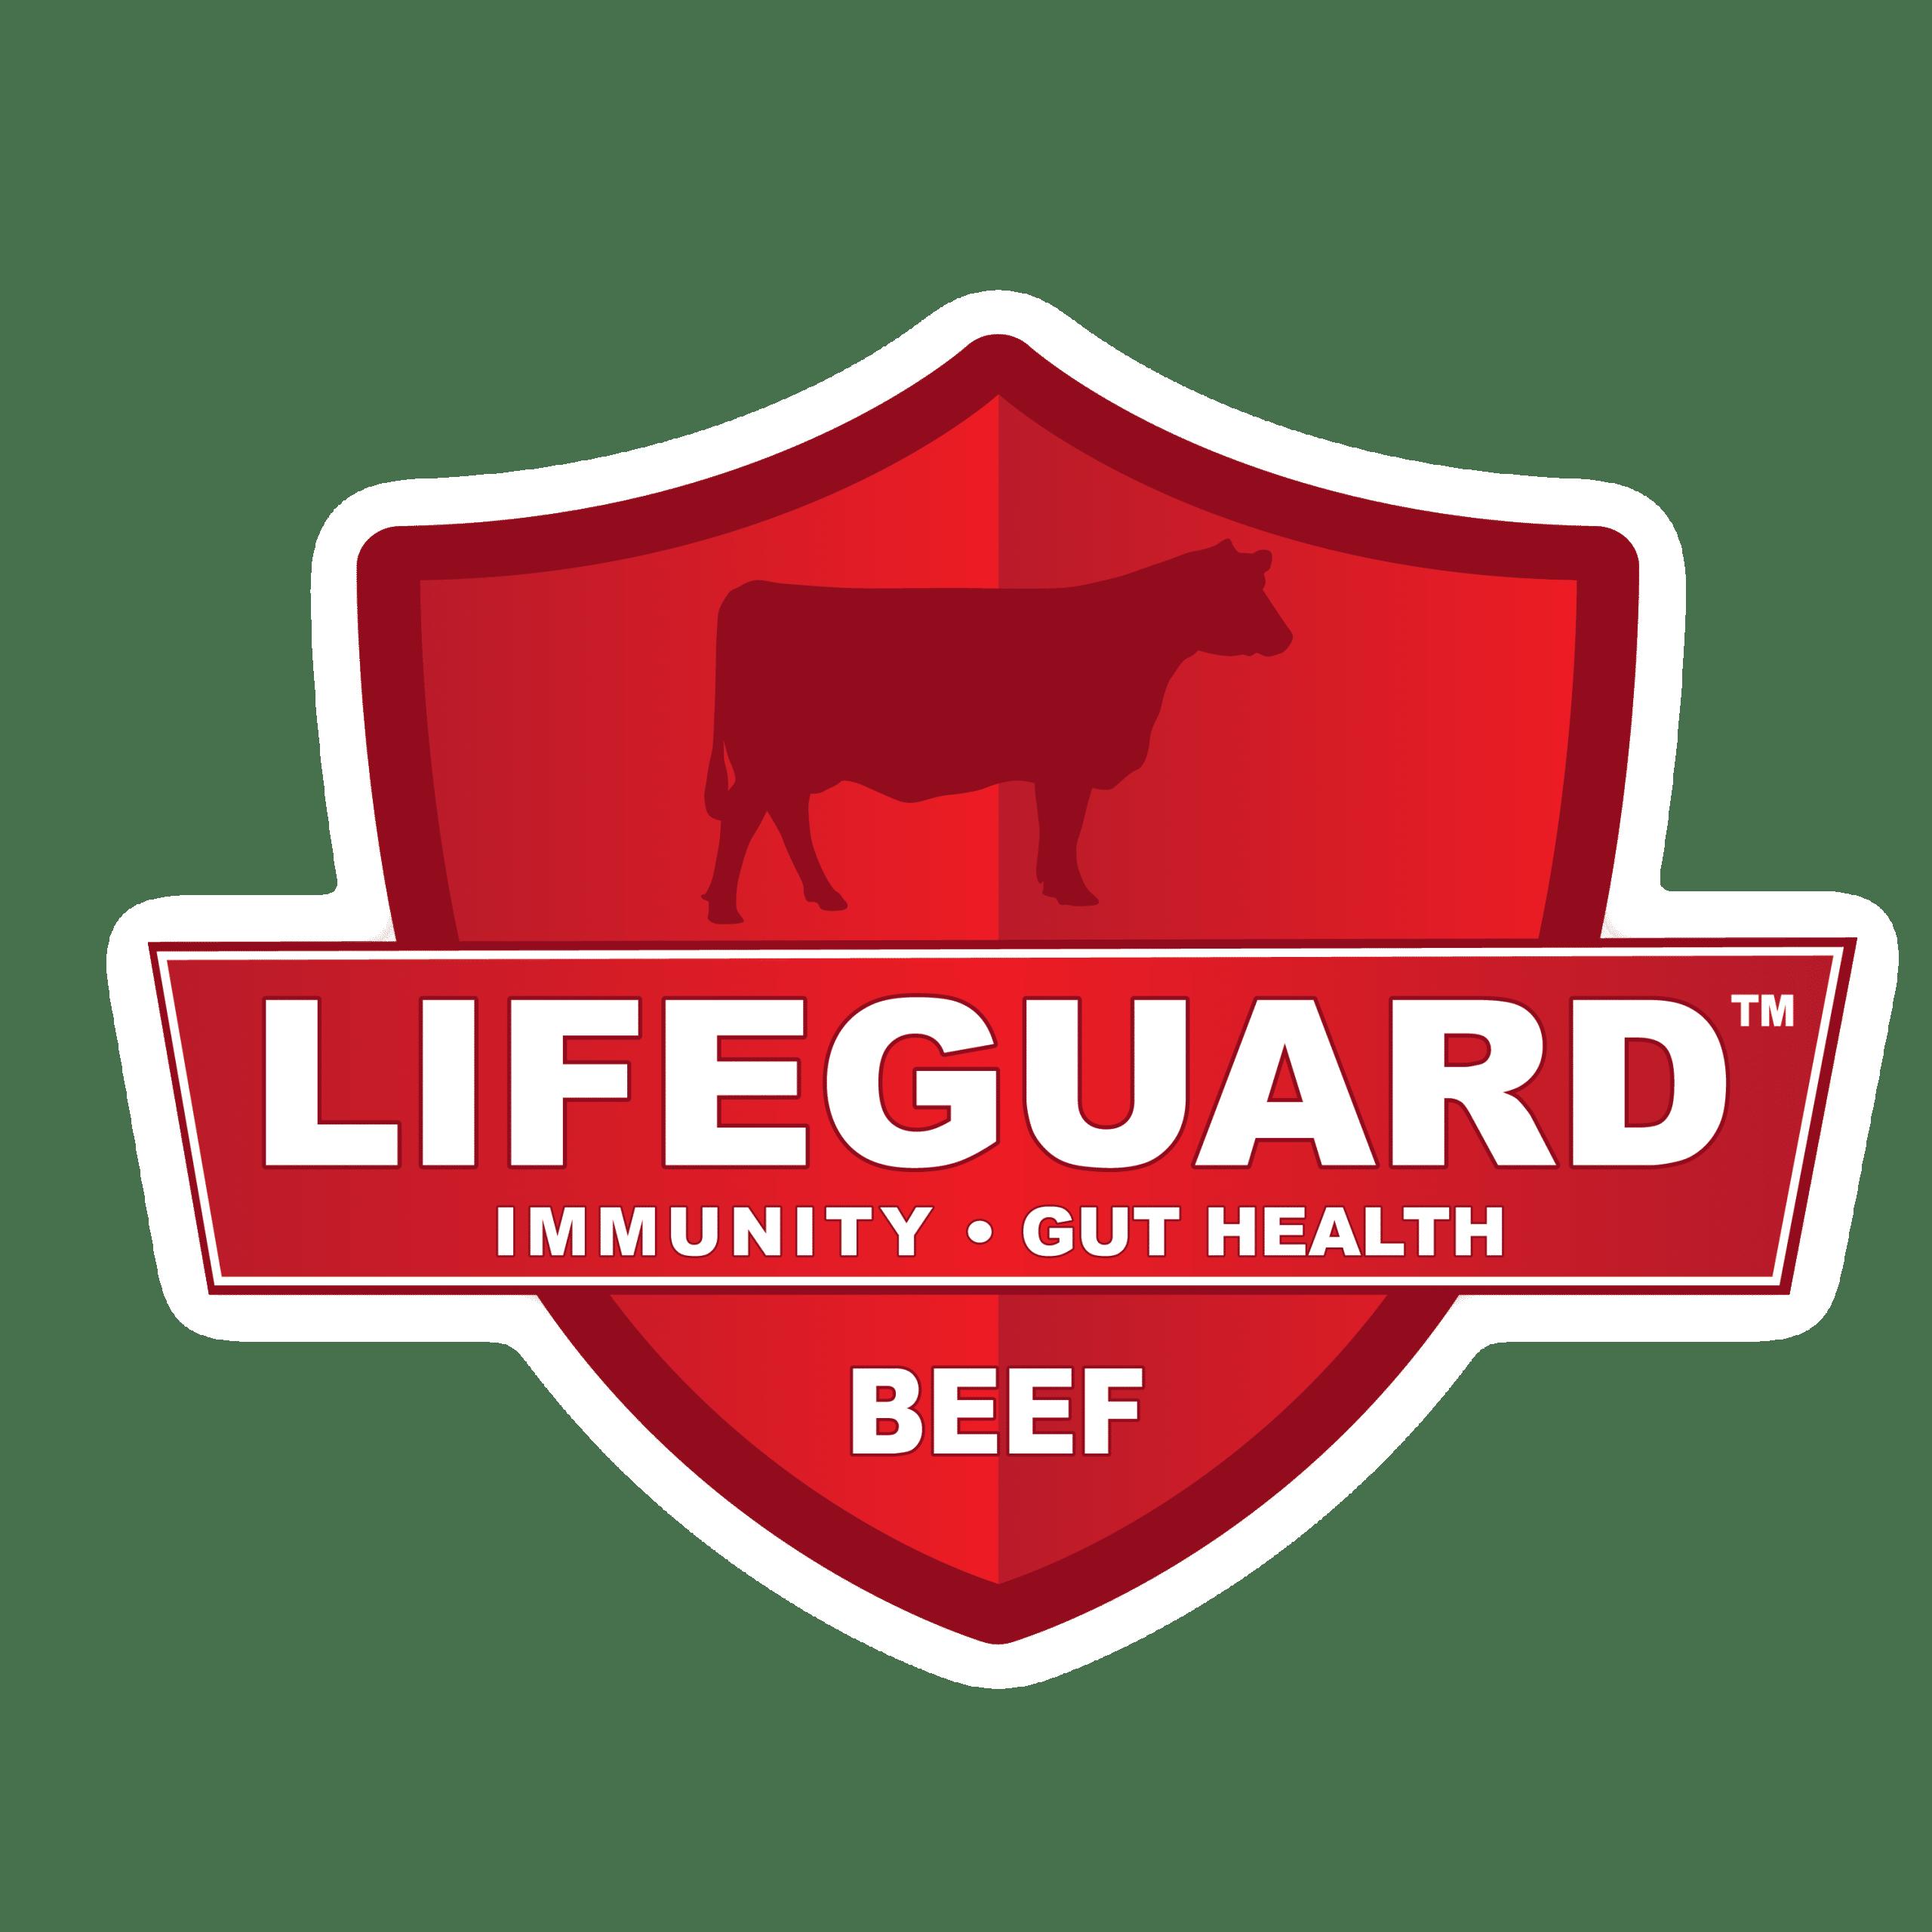 Beef Lifeguard